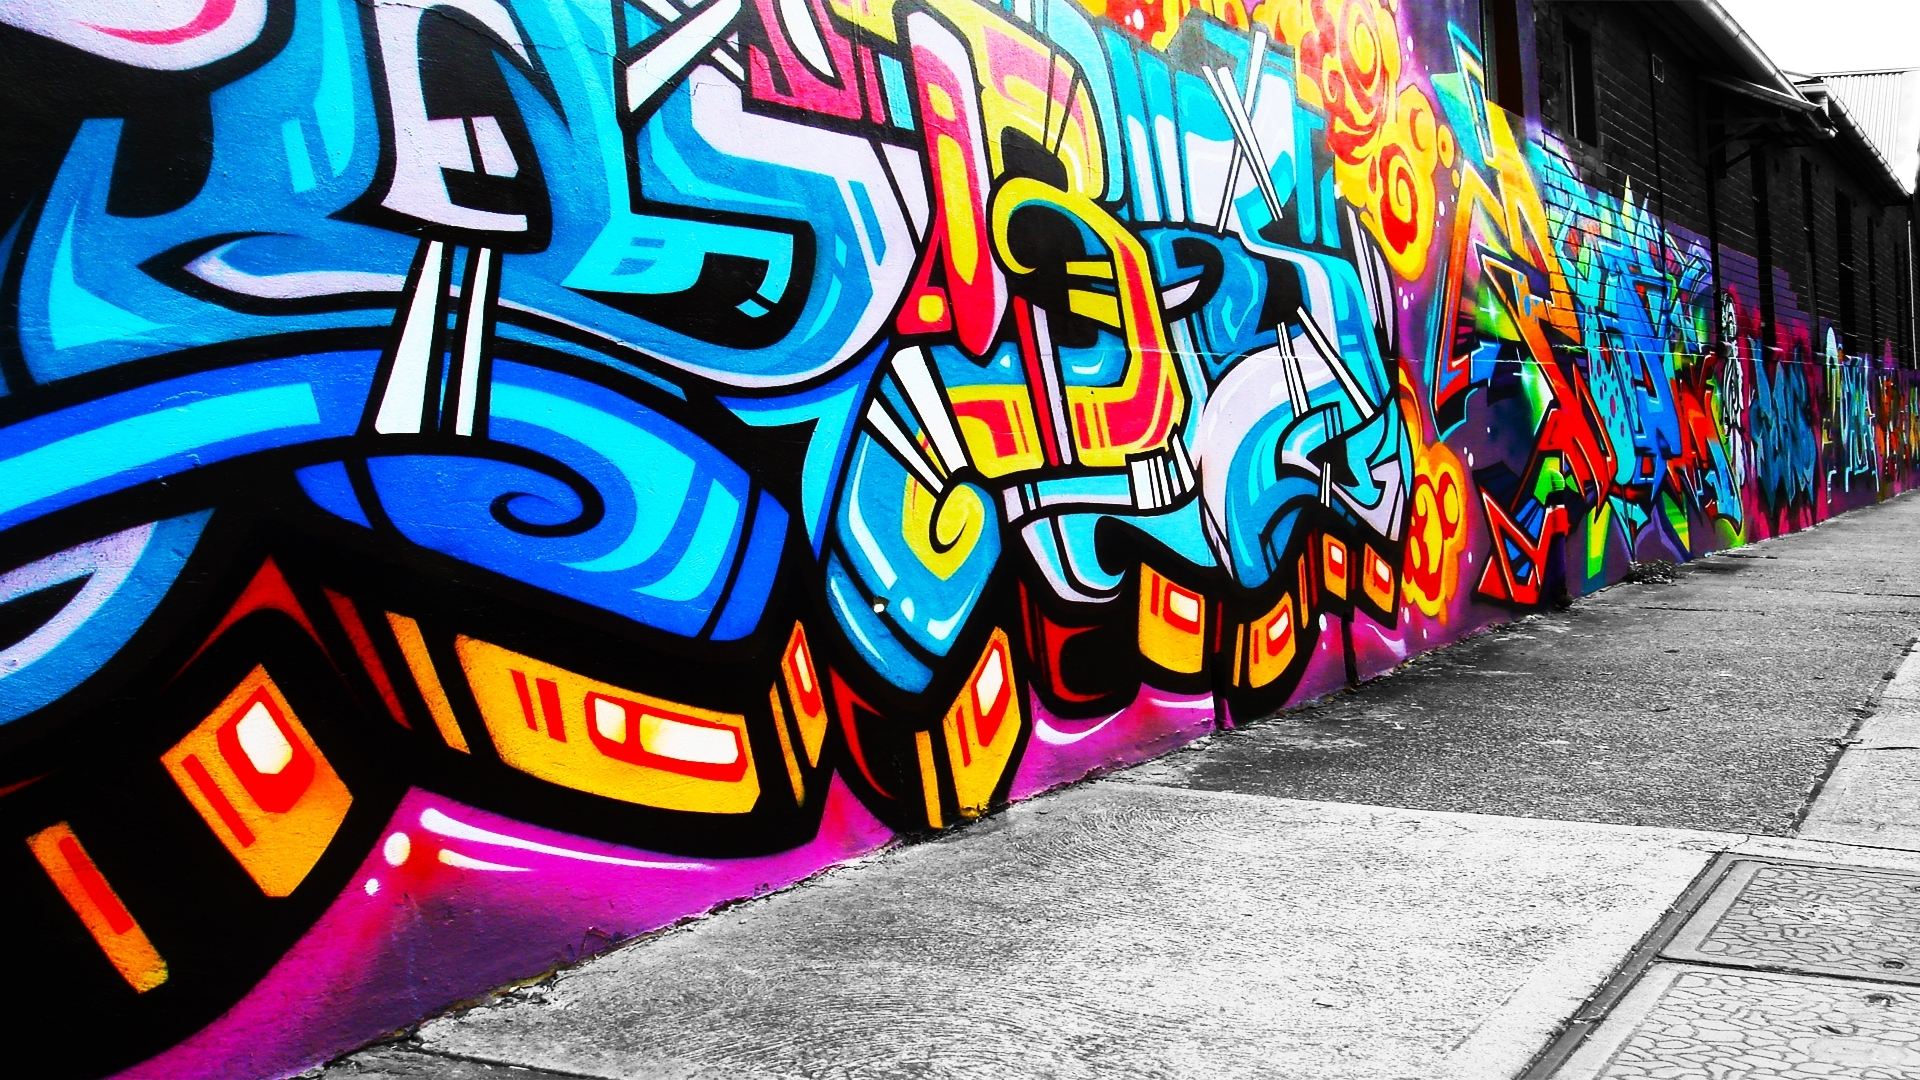 free graffiti art wallpaper images « long wallpapers